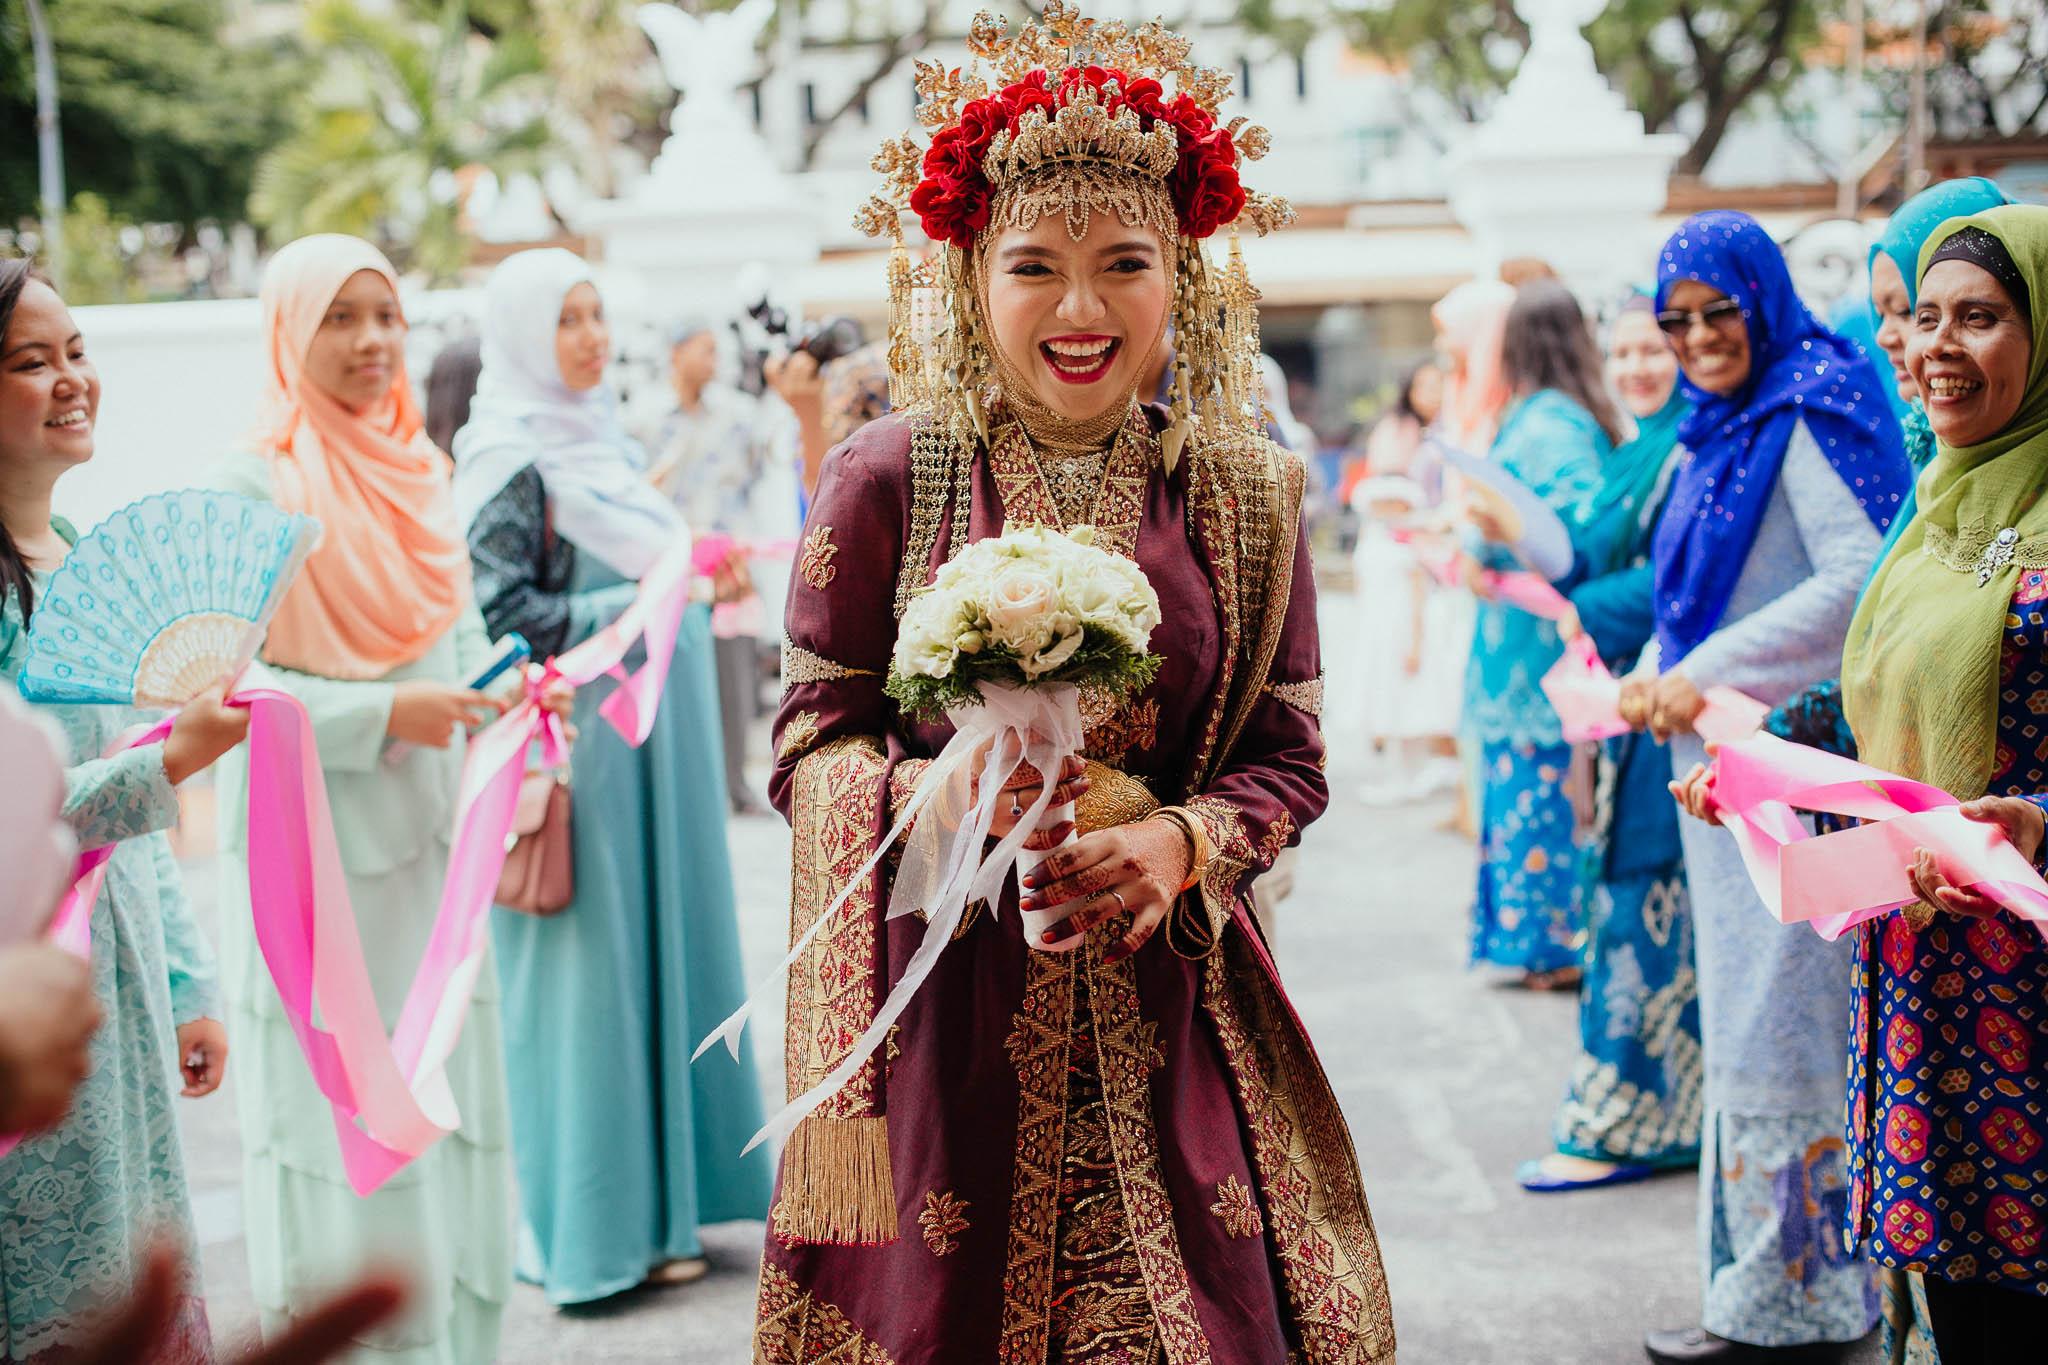 singapore-wedding-photographer-malay-indian-pre-wedding-travel-wmt-2015-23.jpg